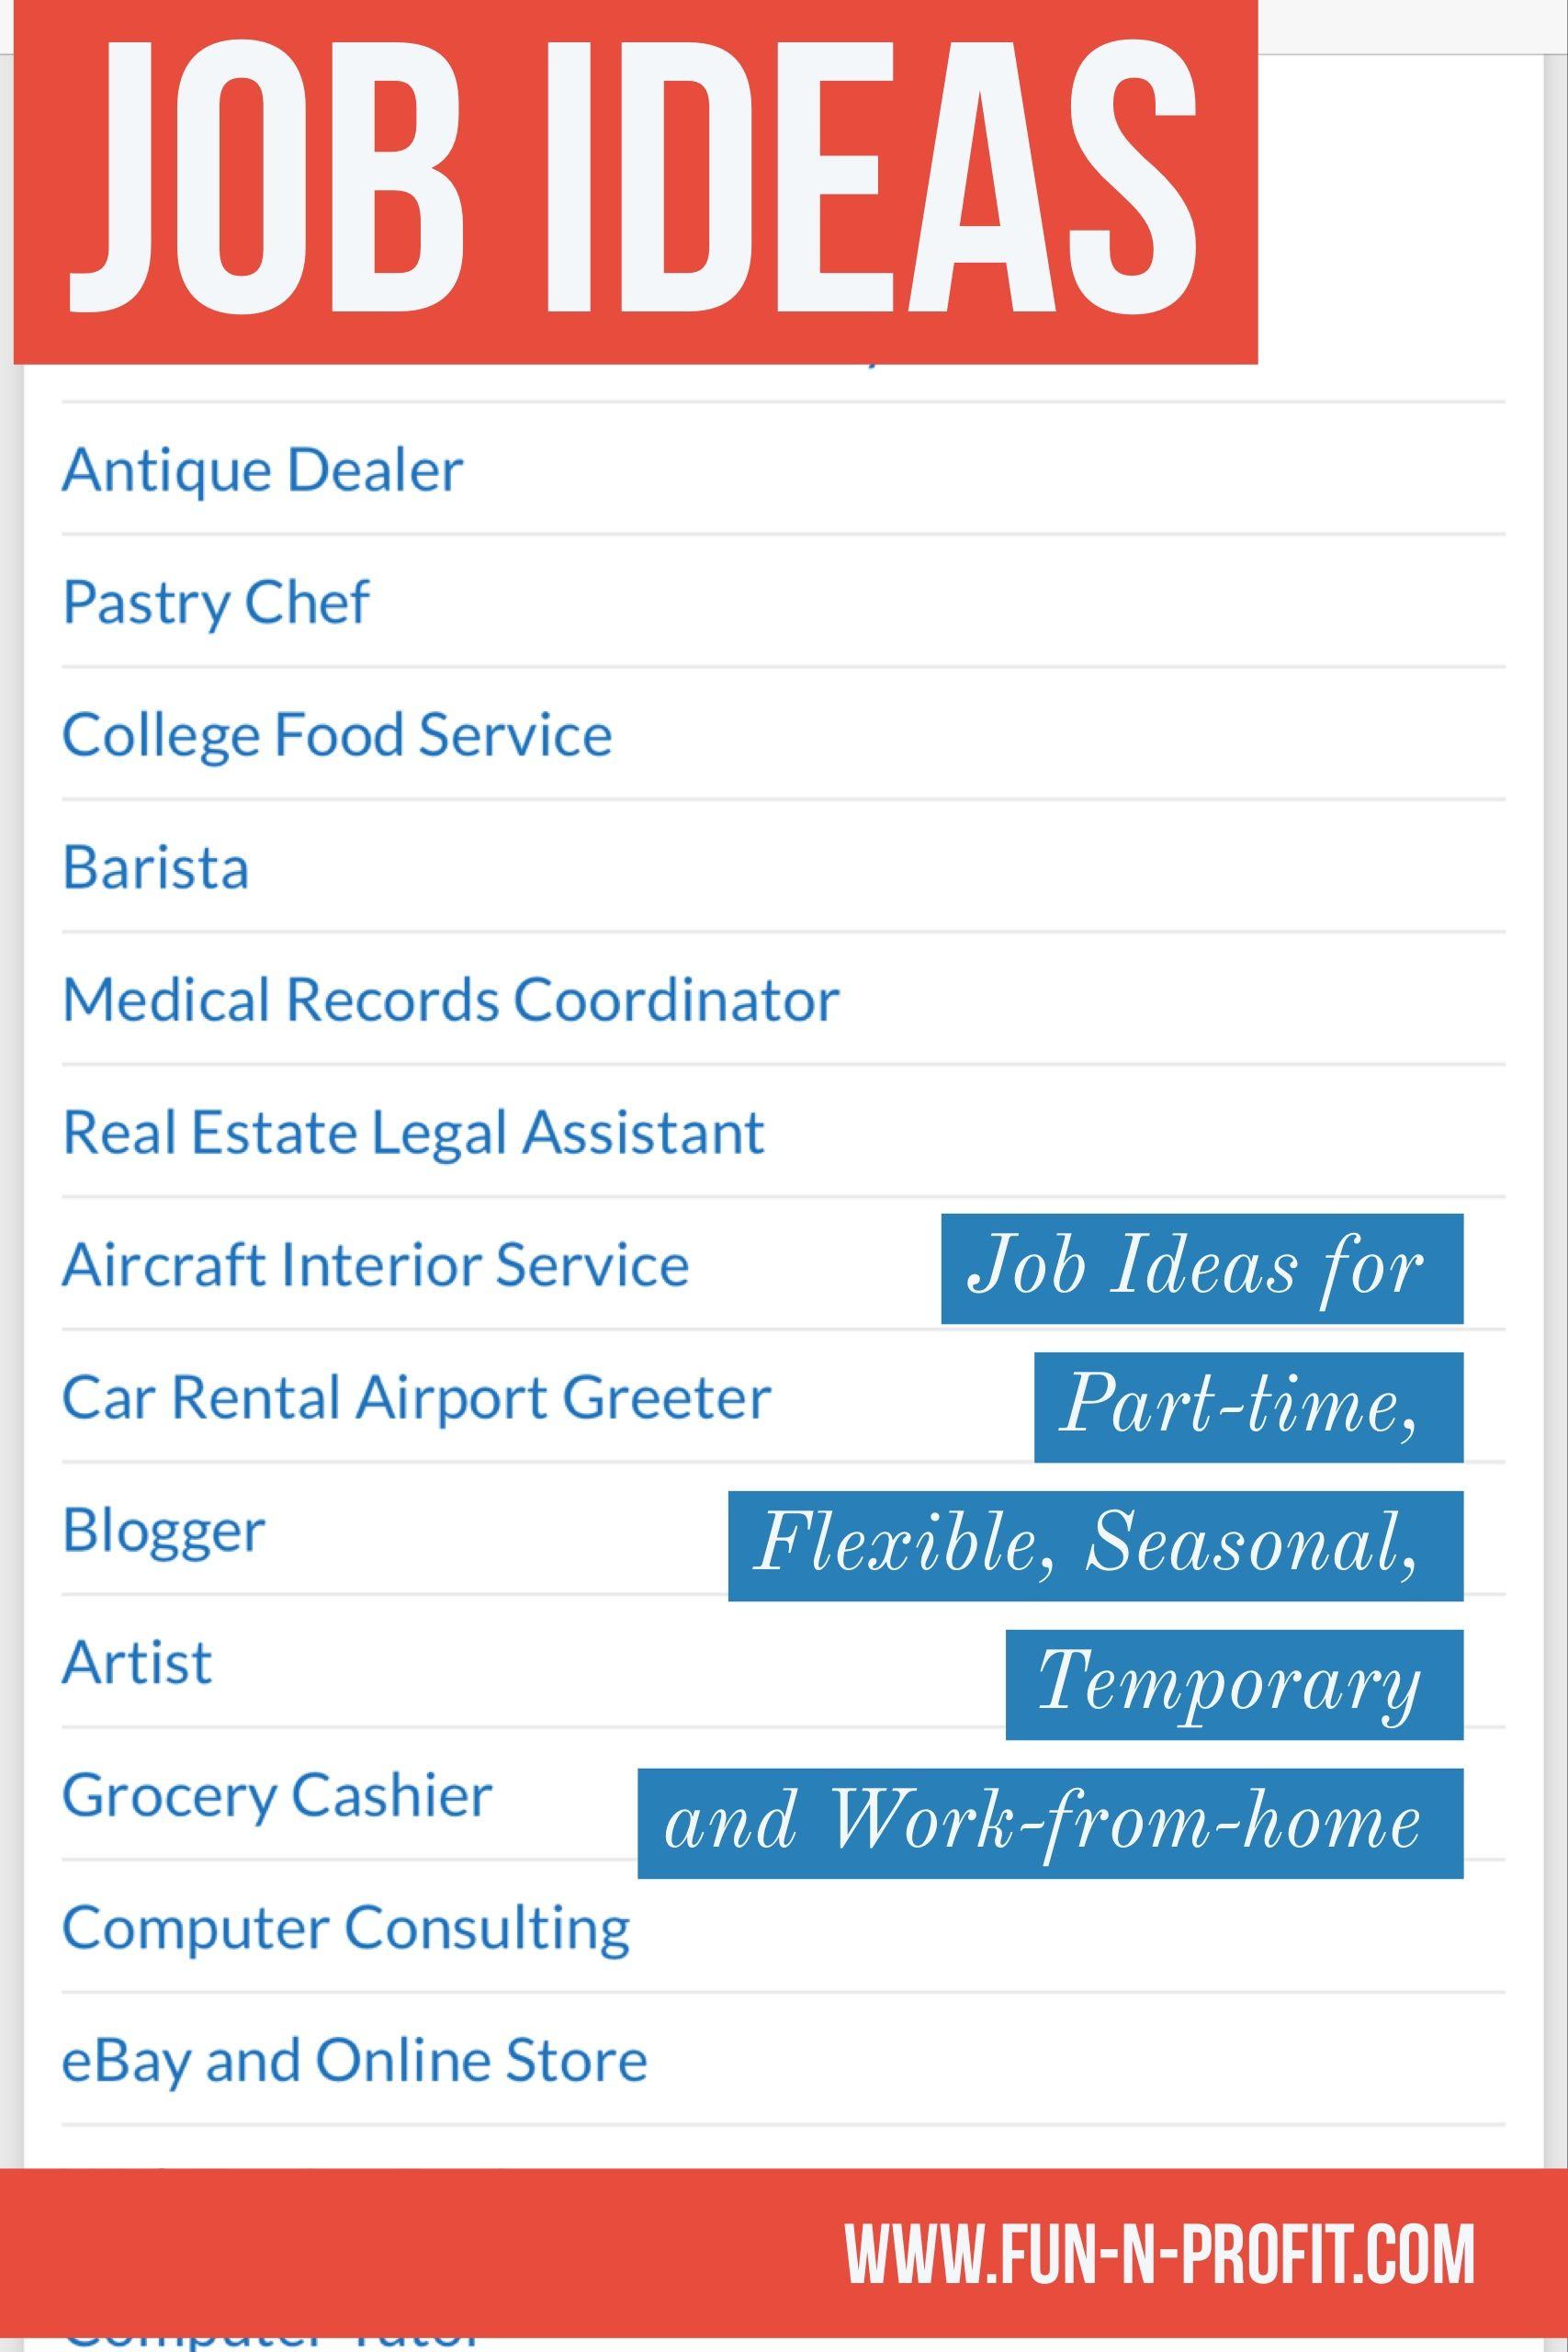 part-time job ideas like barista, medical records coordinator, real